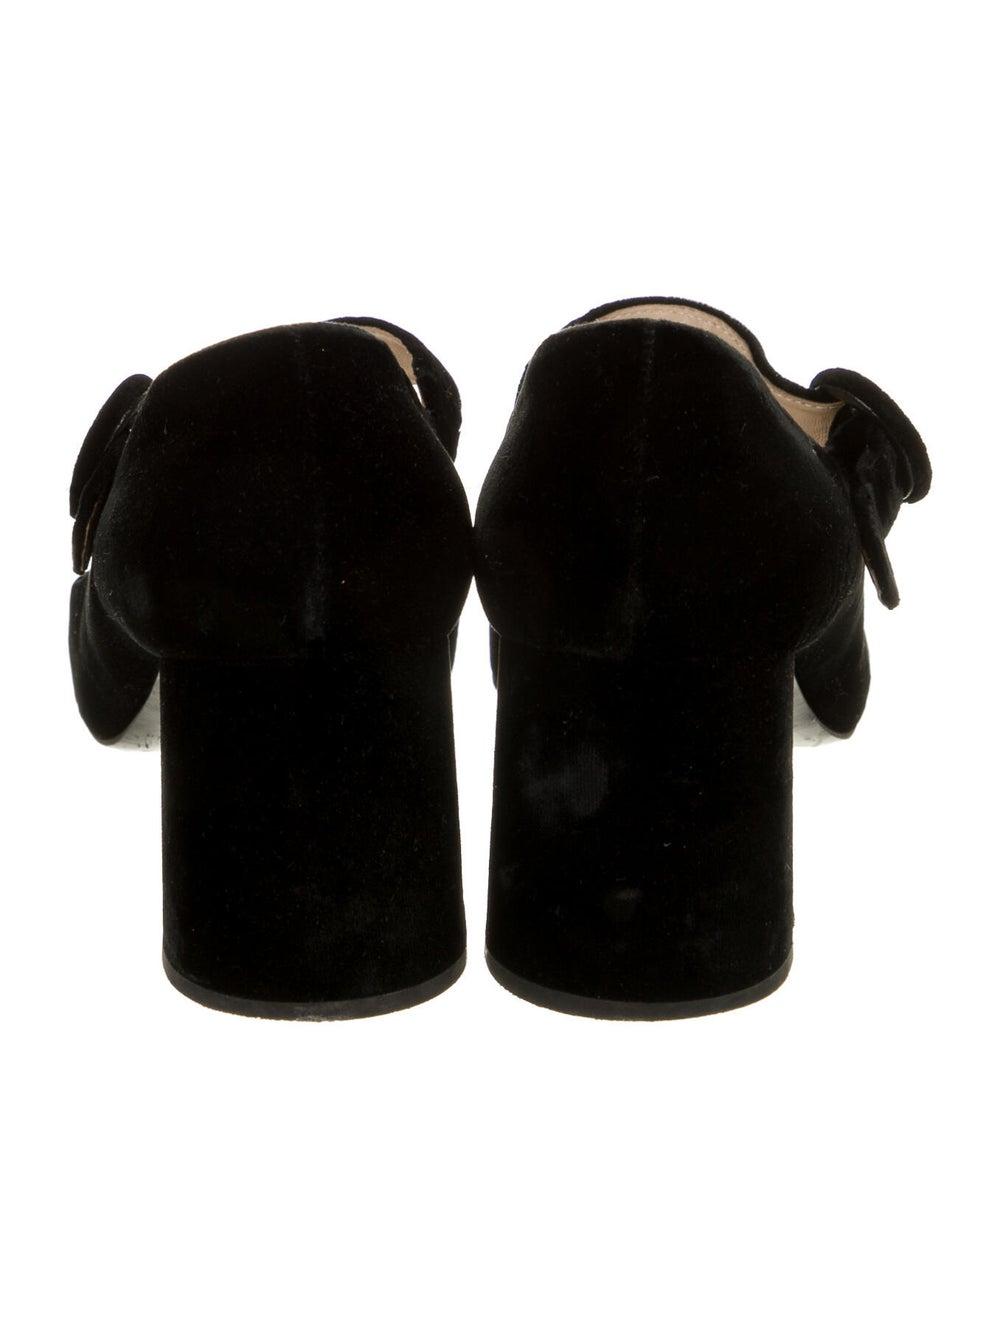 Prada Pumps Black - image 4